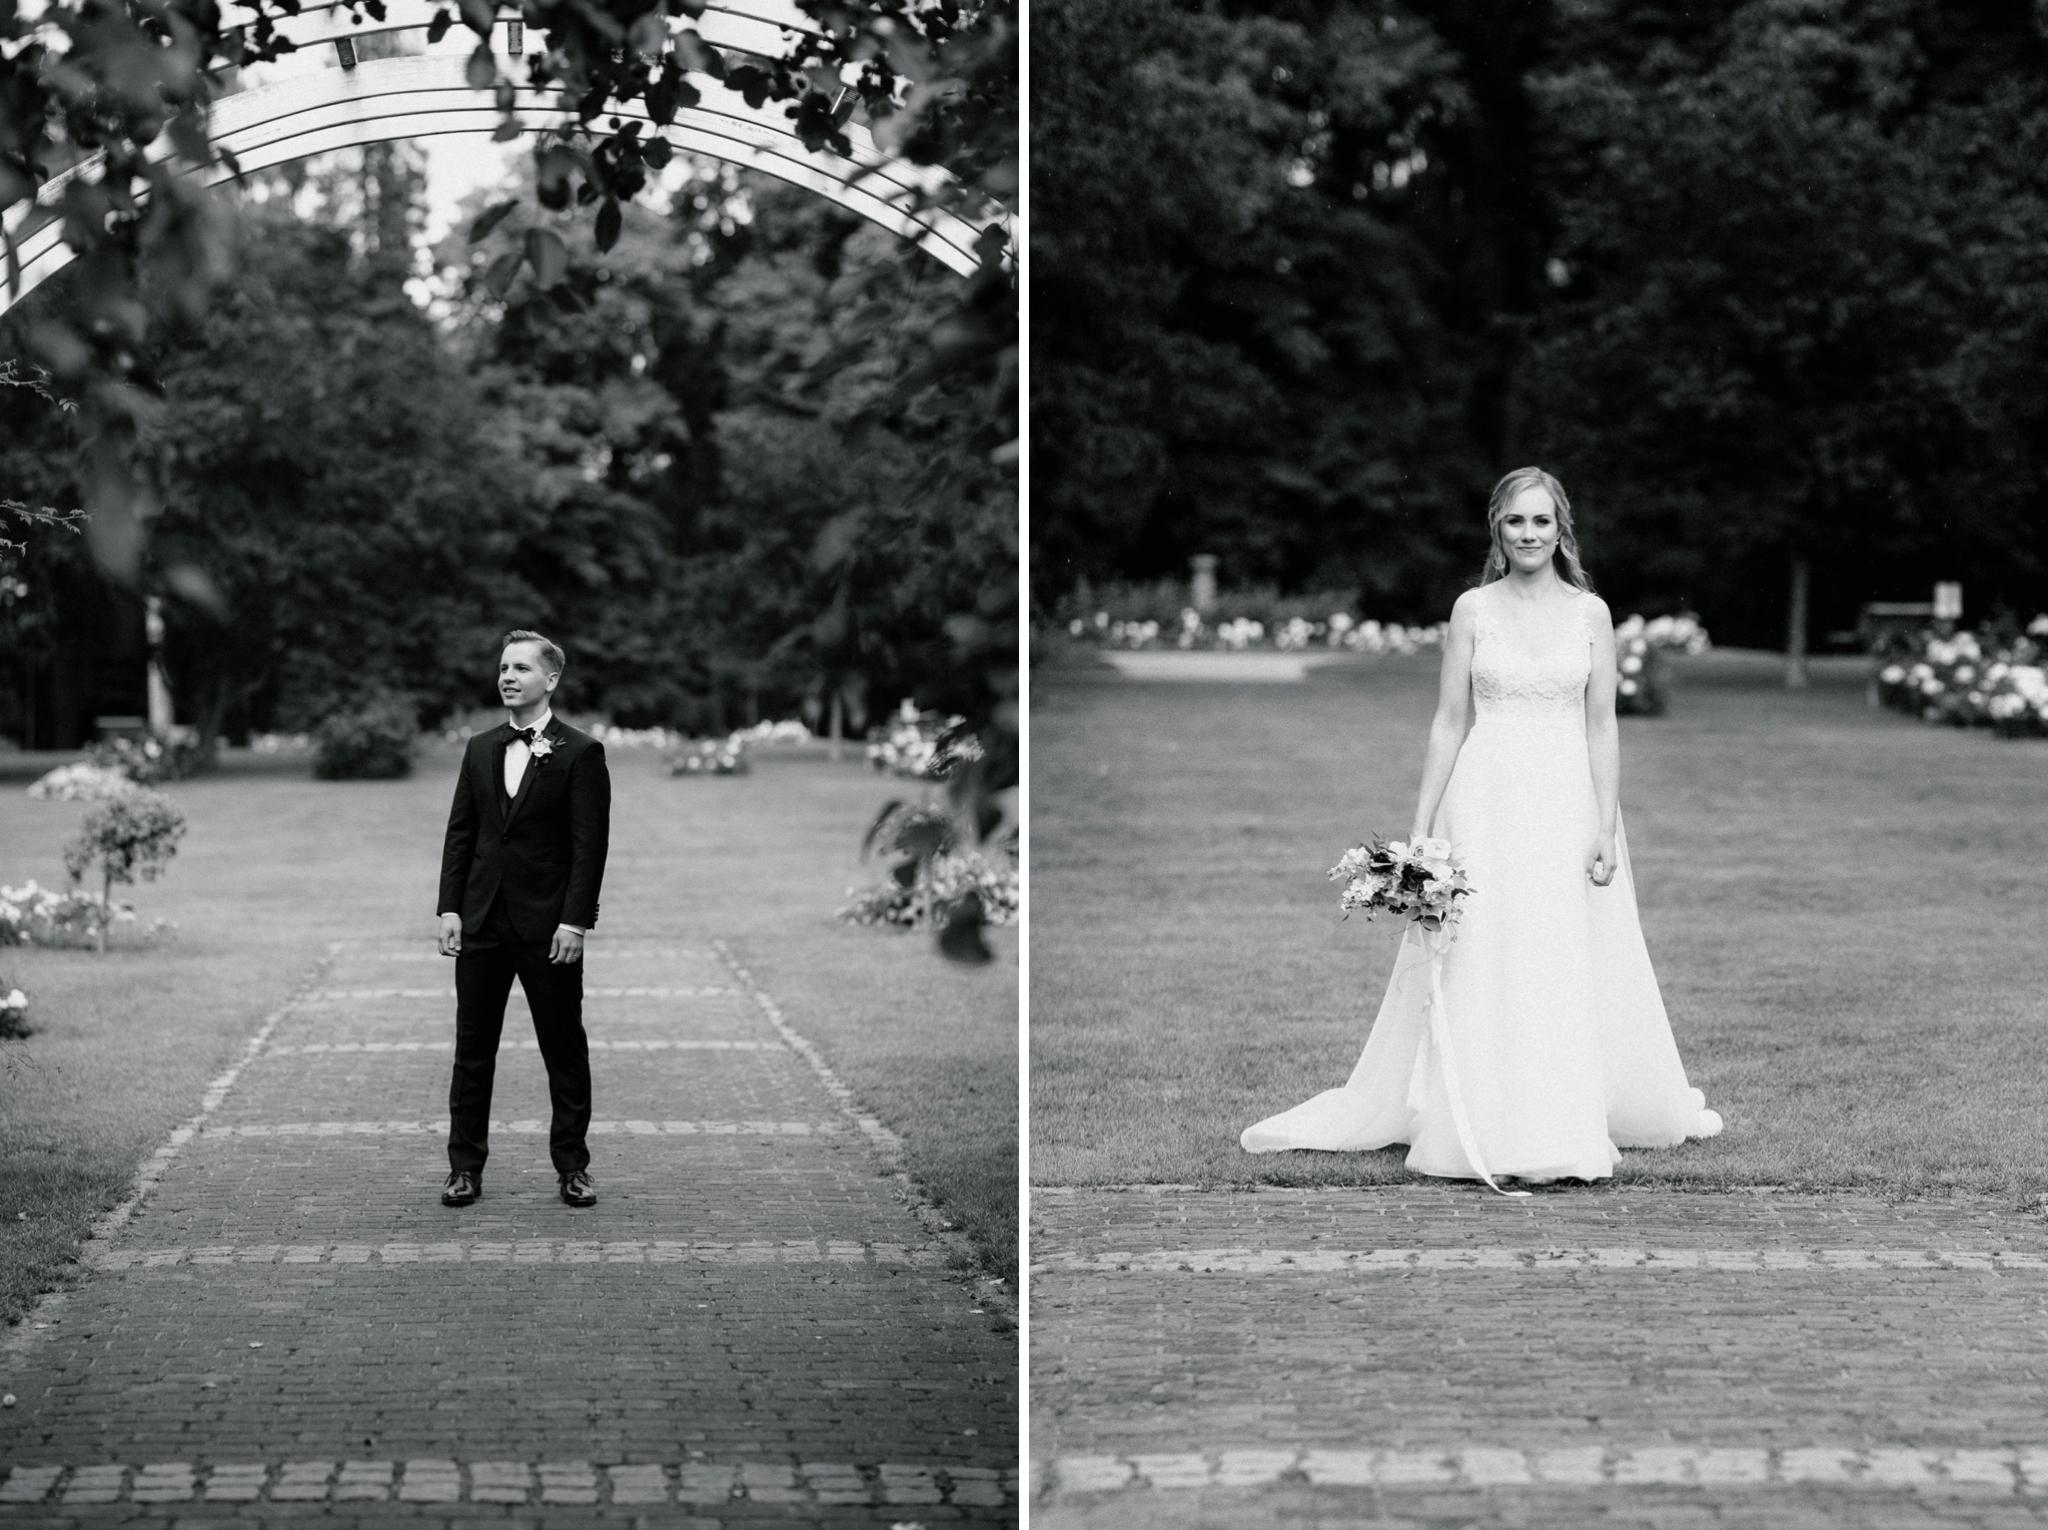 Johanna + Mikko - Tampere - Photo by Patrick Karkkolainen Wedding Photographer-14.jpg